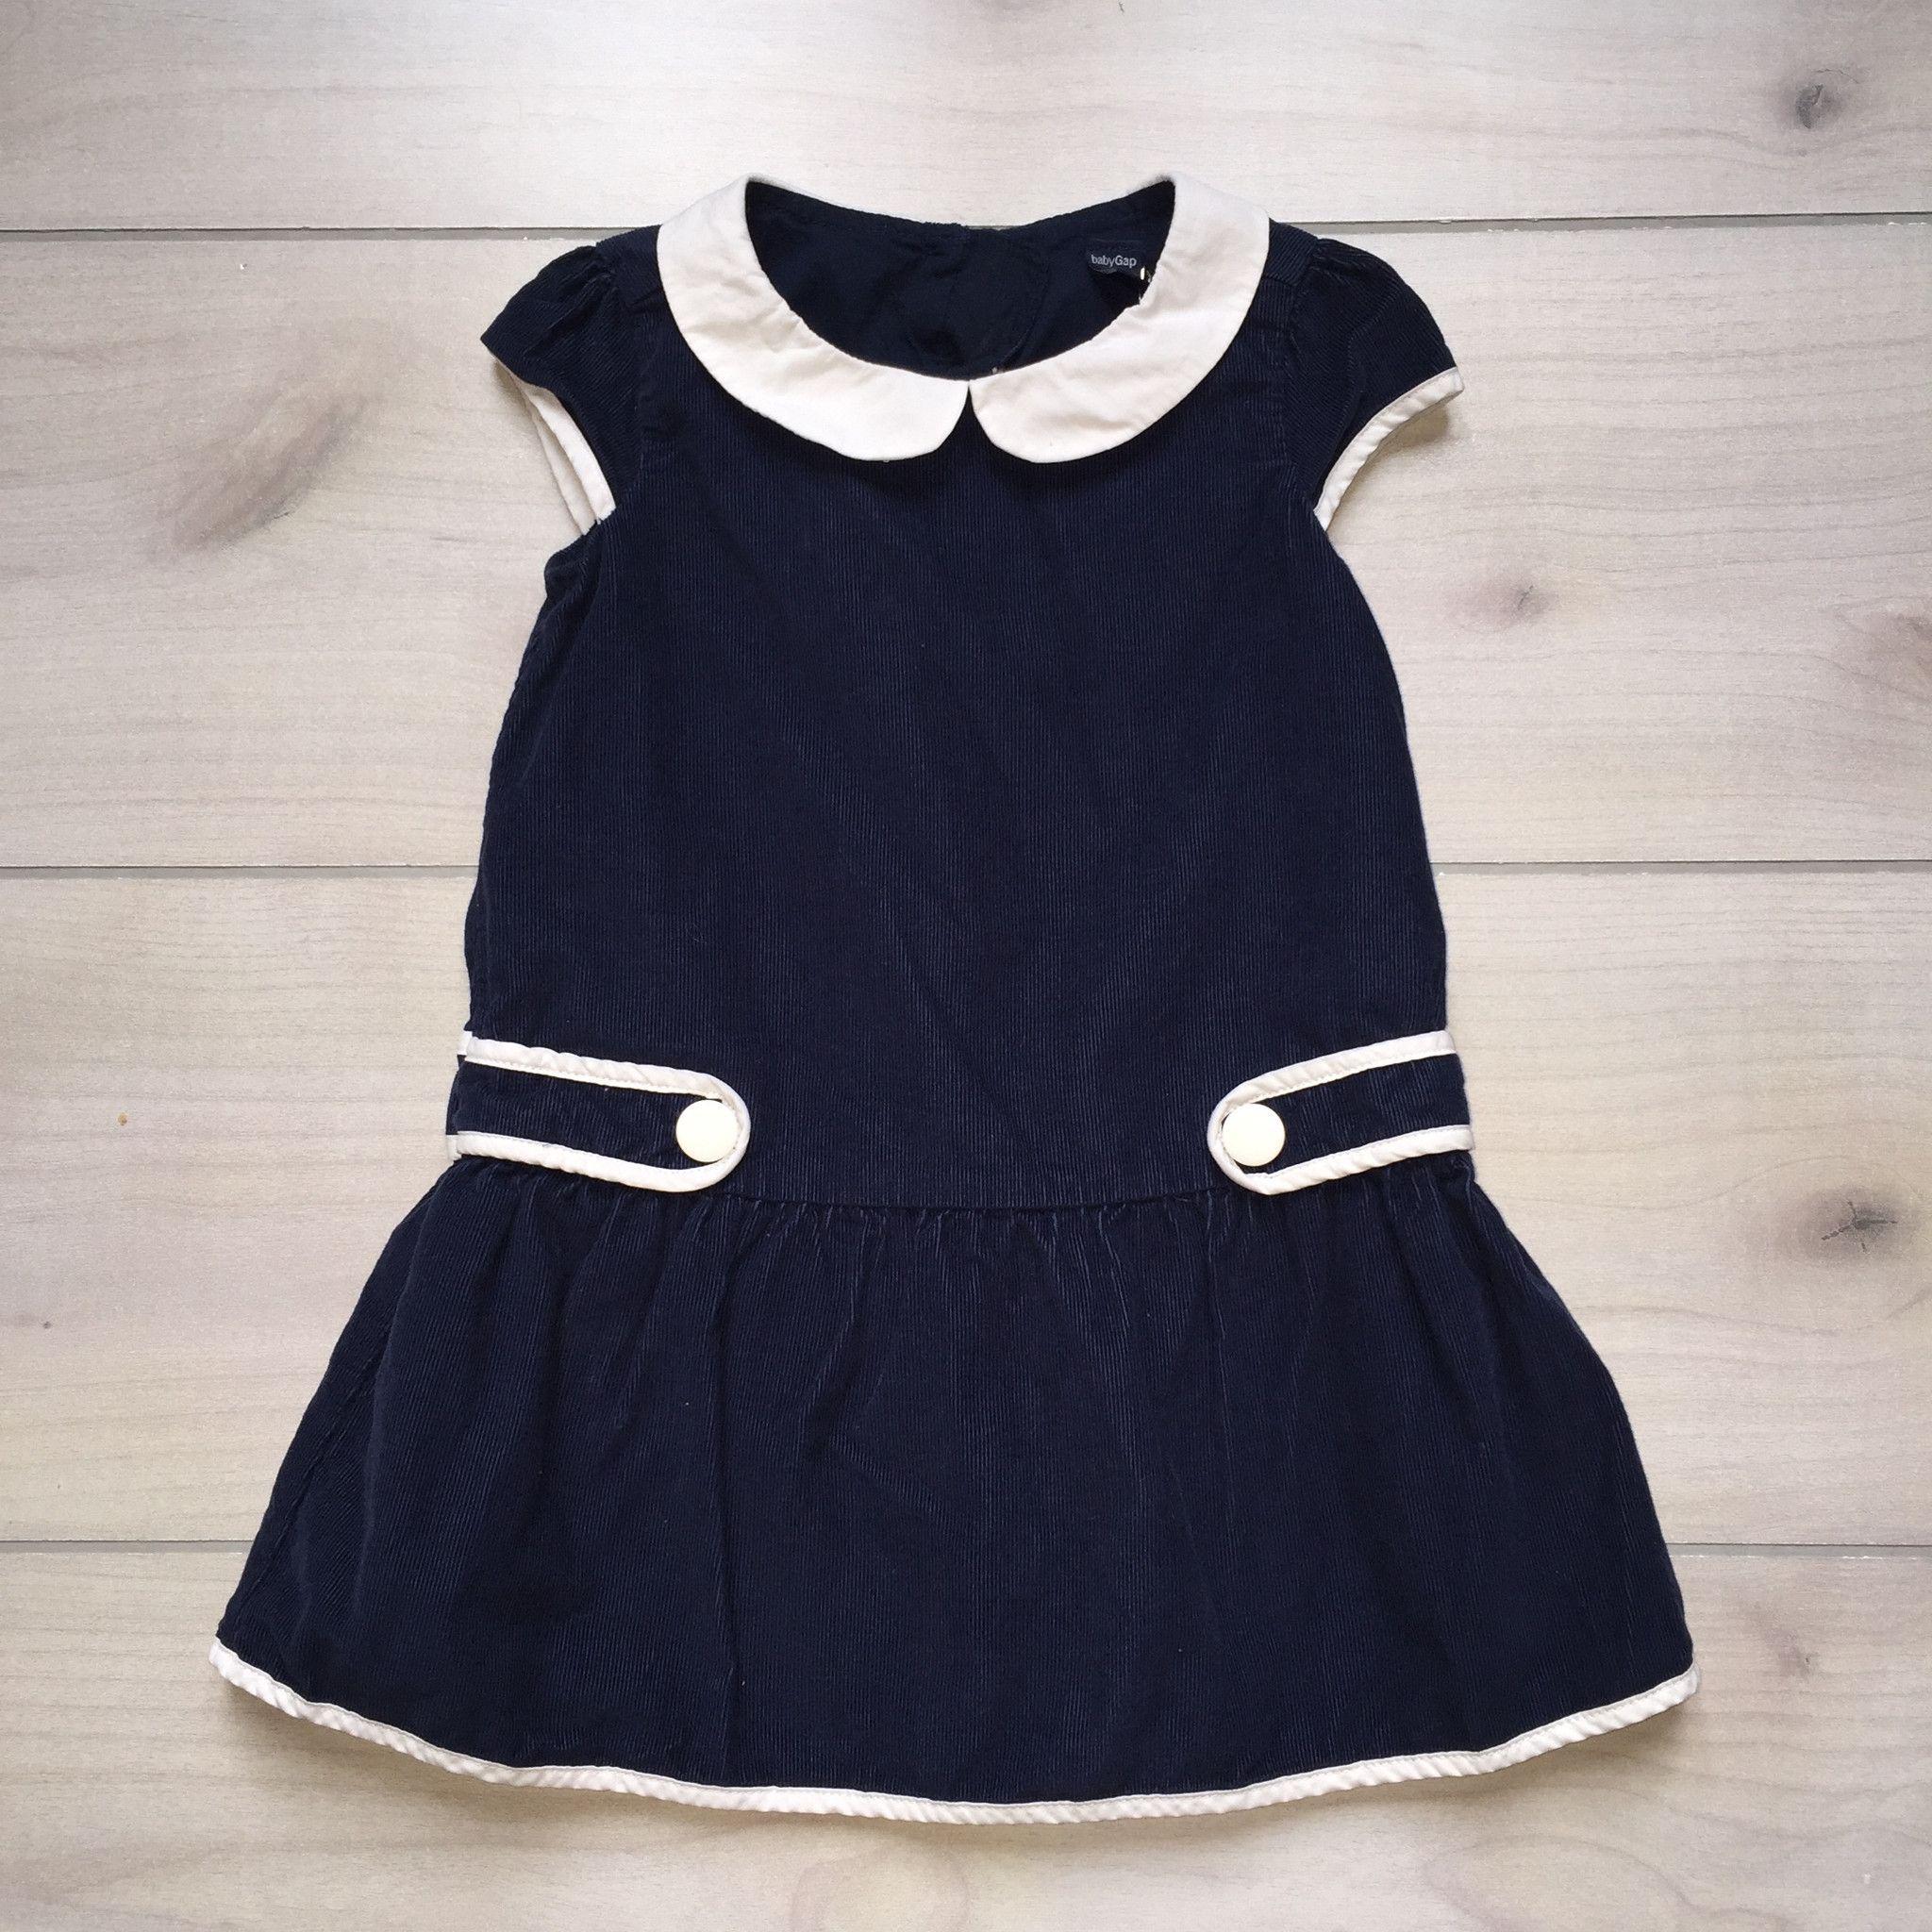 Baby Gap Velour Navy Trim Dress